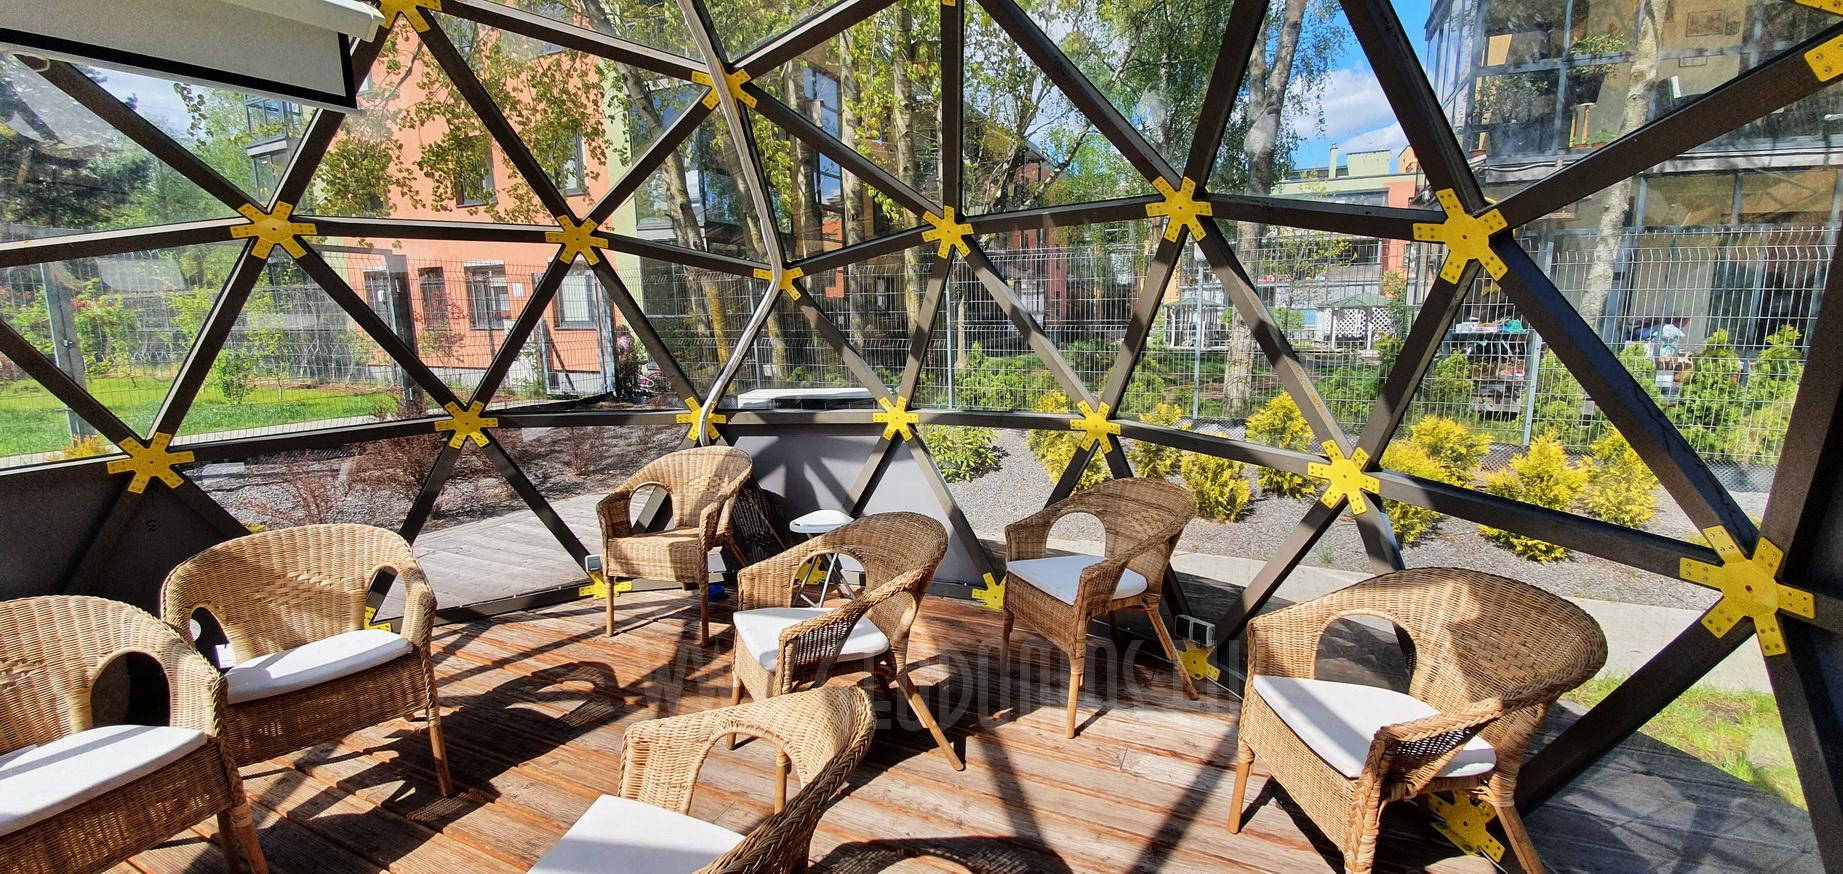 20m2 Public Lounge Dome | Fontanu Namai, Vilnius